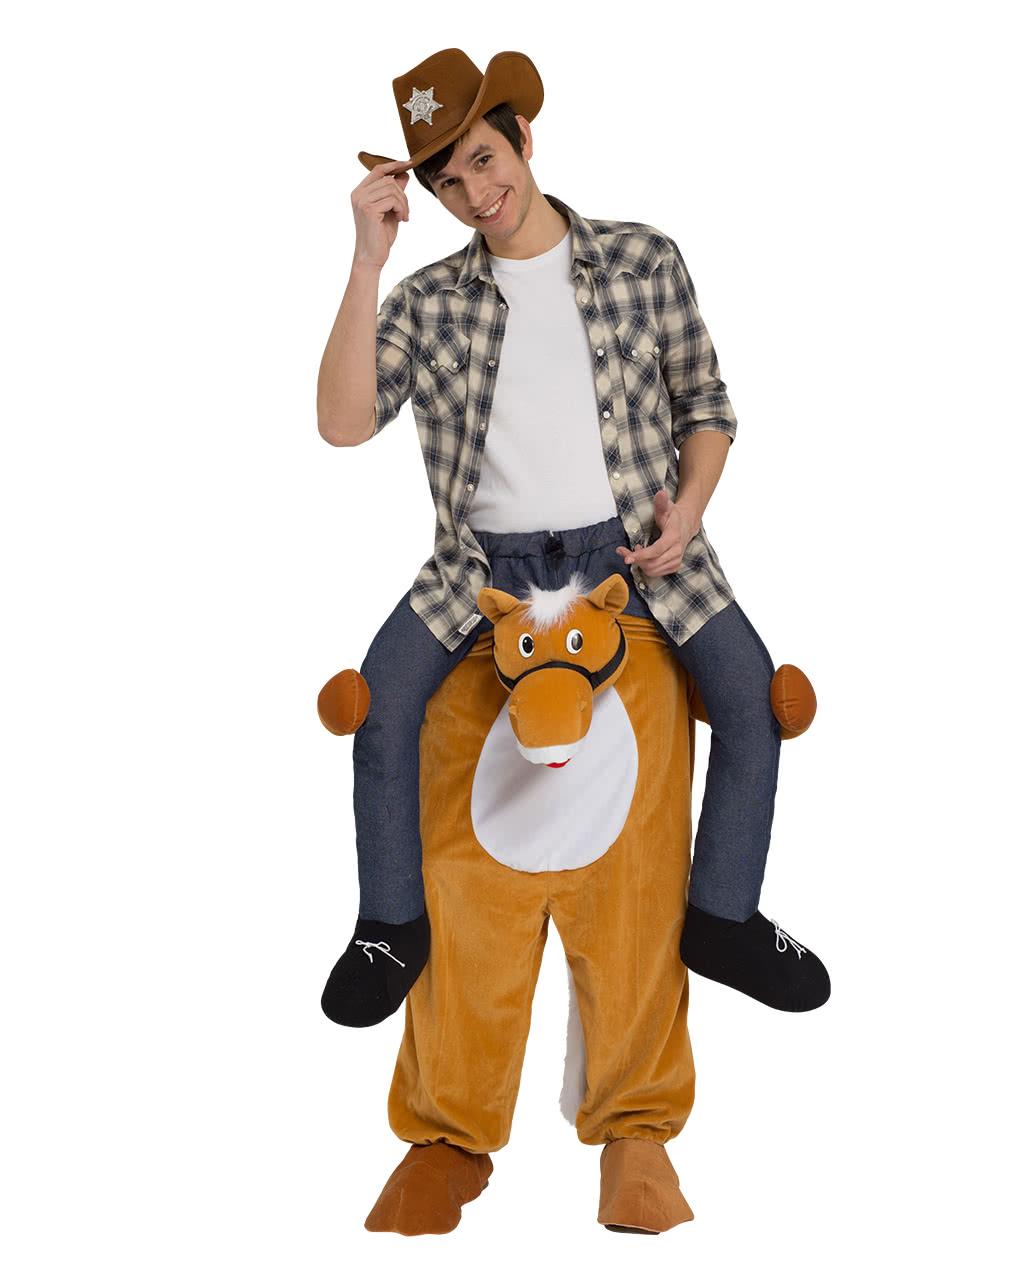 reitender cowboy carry me kost m f r fasching karneval universe. Black Bedroom Furniture Sets. Home Design Ideas